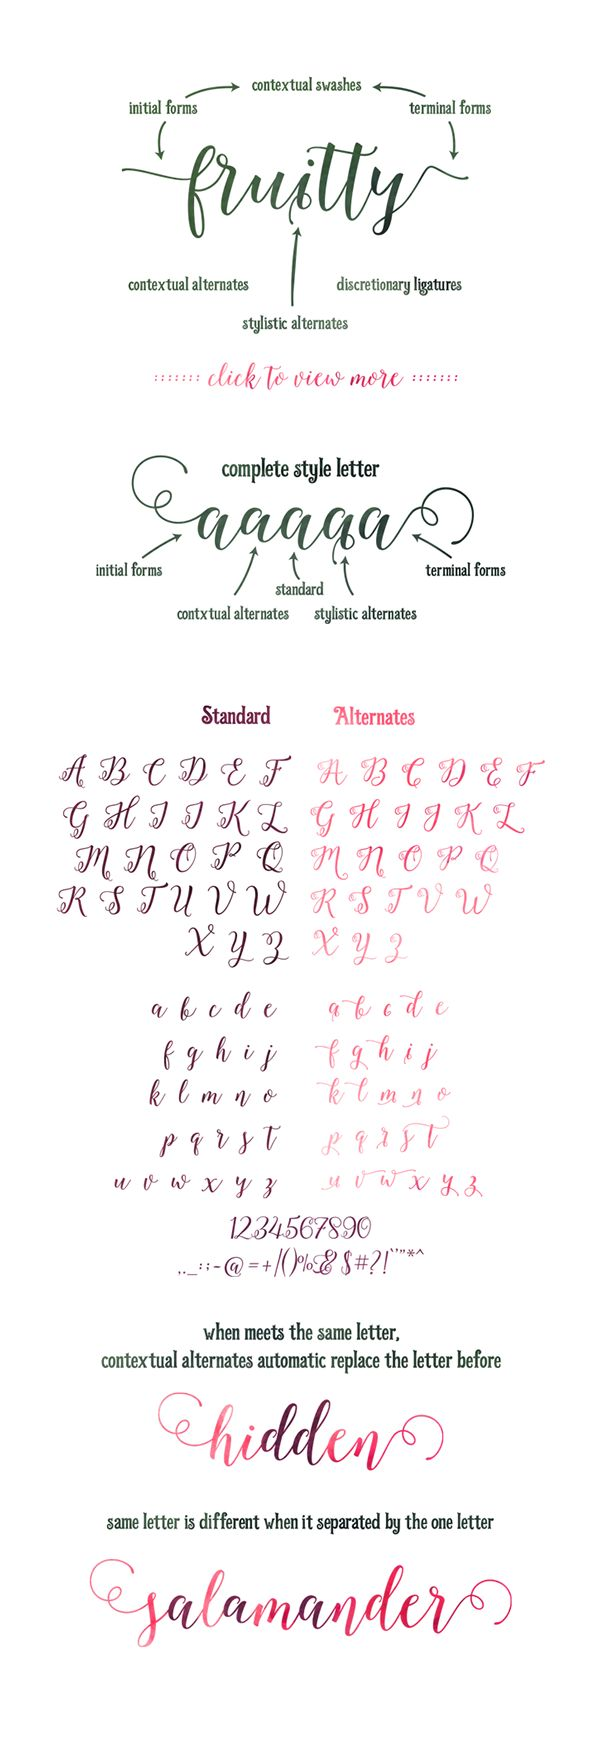 Octavia Script - Modern Calligraphy Typefaces on Behance